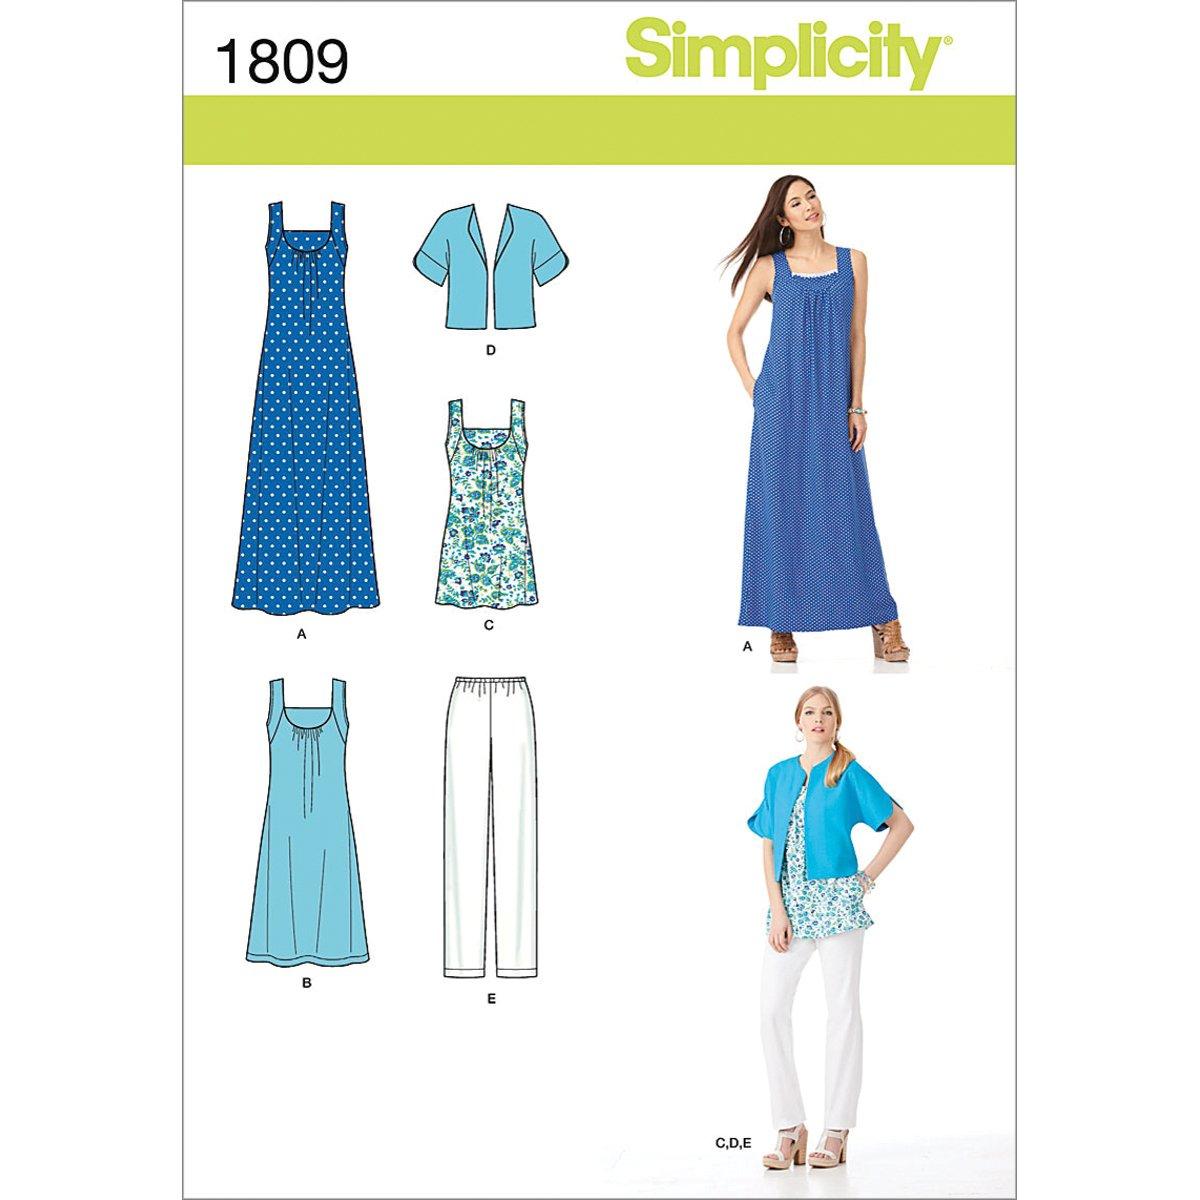 Simplicity 1809 Misses Sportswear Sized XXS-XXL Sewing Pattern, Size A (XXS-XS-S-M-L-XL-XXL) by Simplicity Creative Group Inc - Patterns   B007SOVIF2